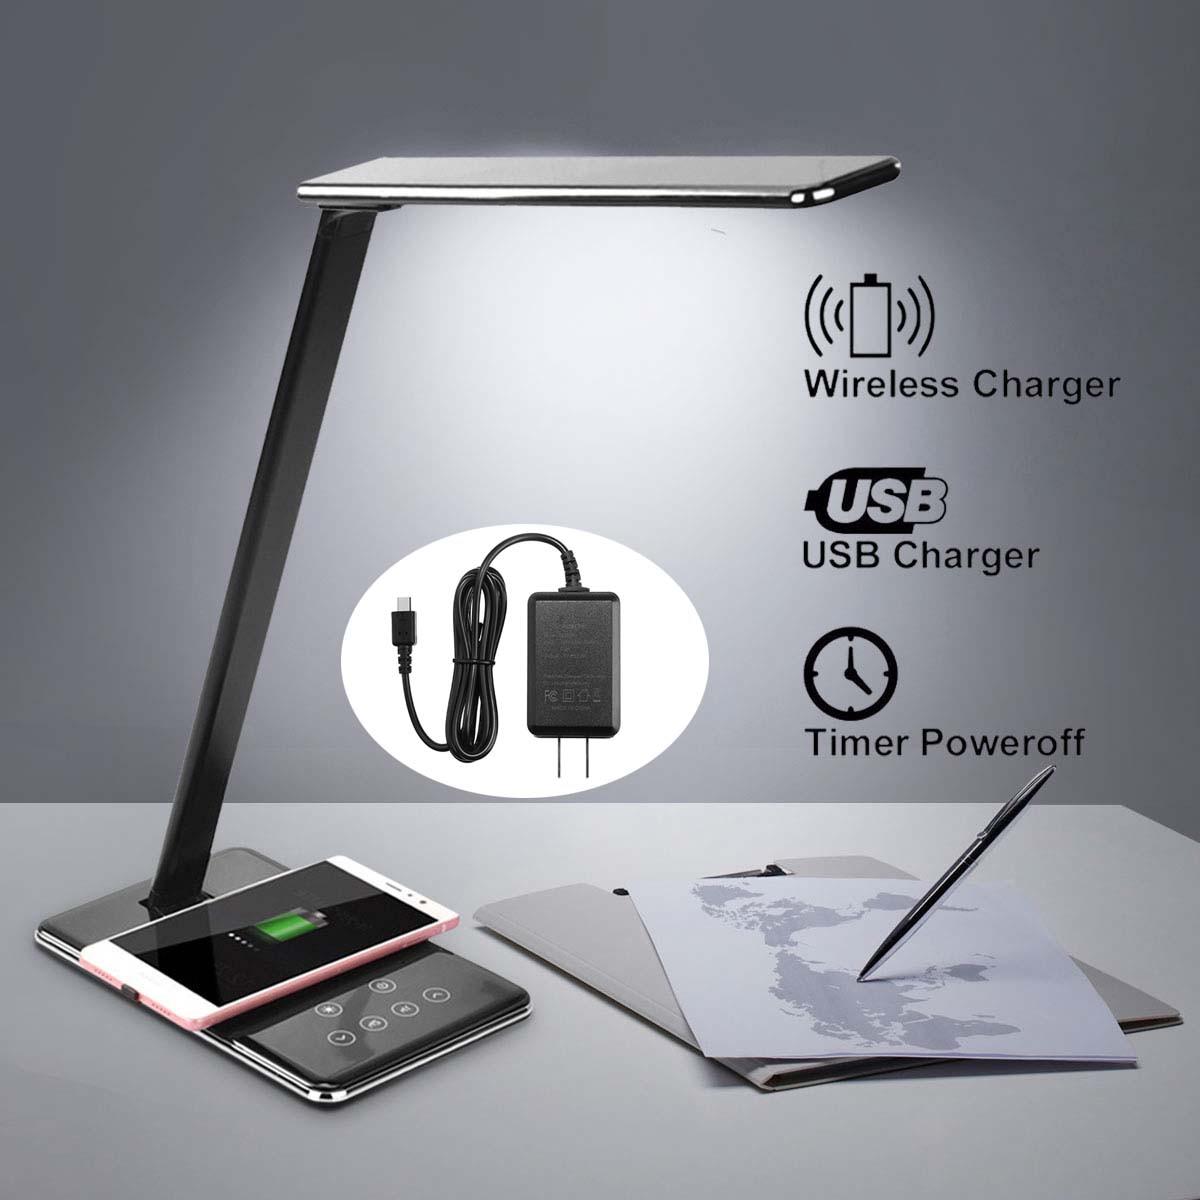 48LED ตารางโคมไฟตั้งโต๊ะ QI ไร้สายชาร์จ Dimming Touch Switch อ่าน Light Charger Pad Eye-protect Book Light พร้อมปลั๊ก